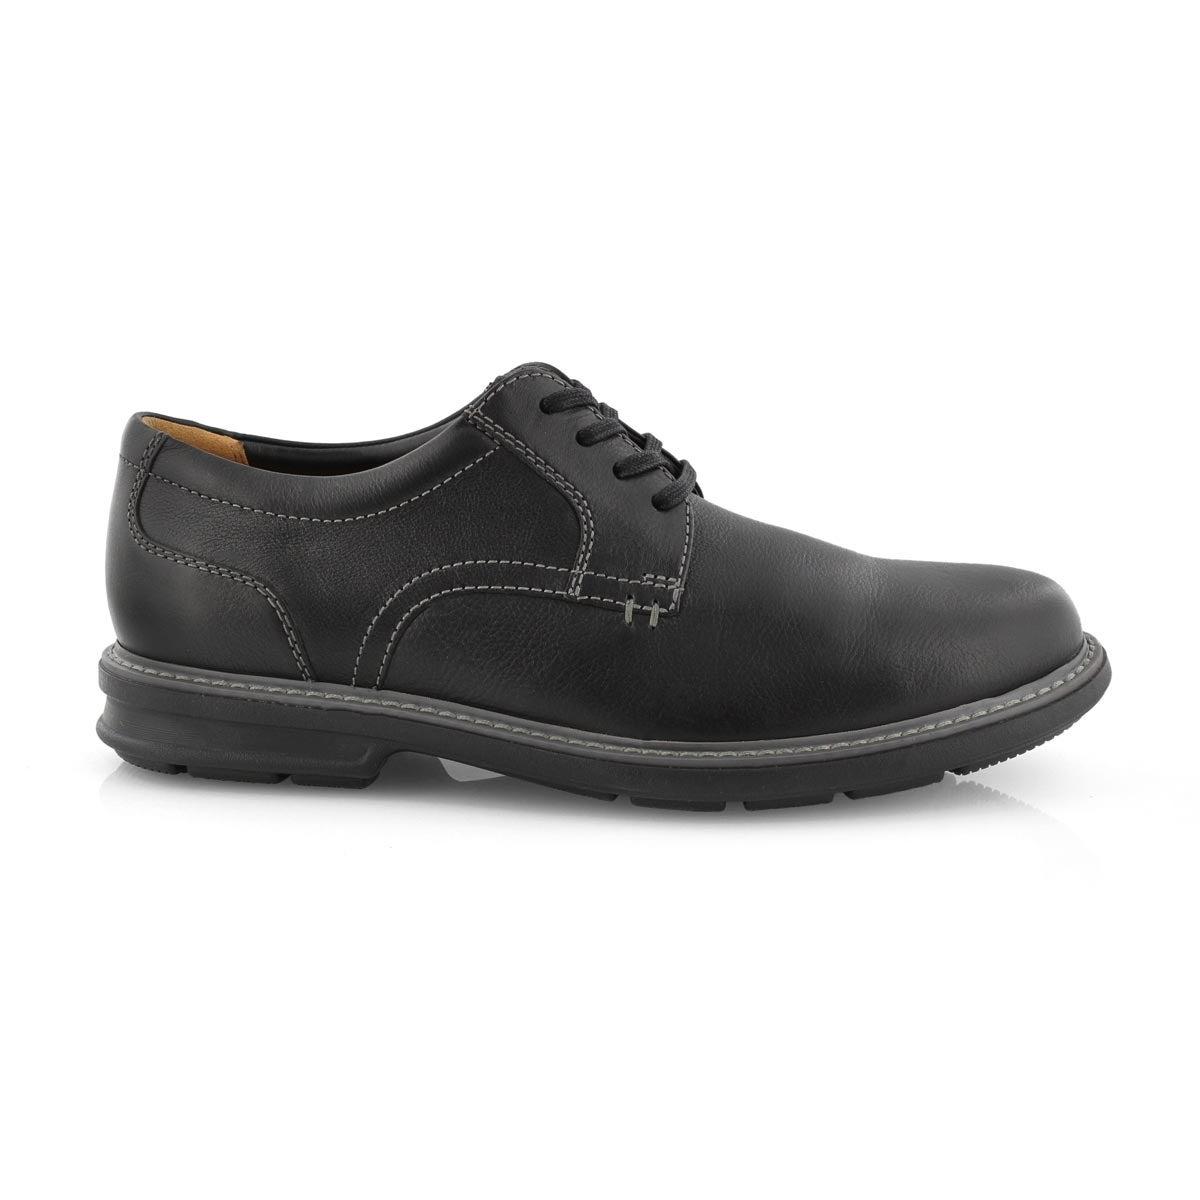 Mns Rendell Plain black casual oxford